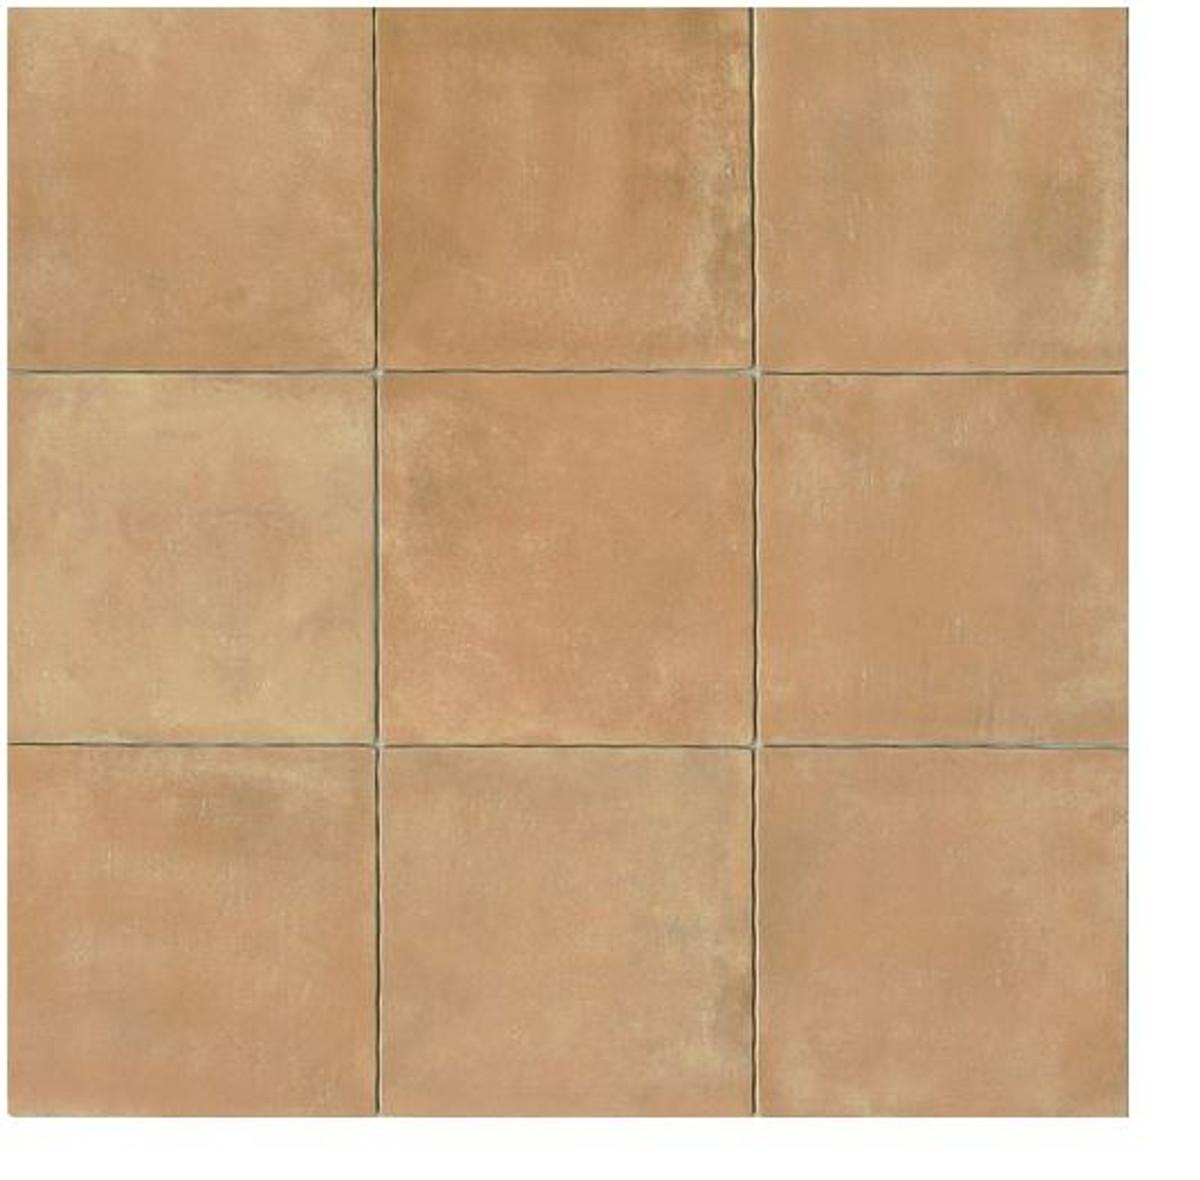 Terra Cotta 14x14 Gloss Finish Cotto Field Tile Cerdena ( Beige )